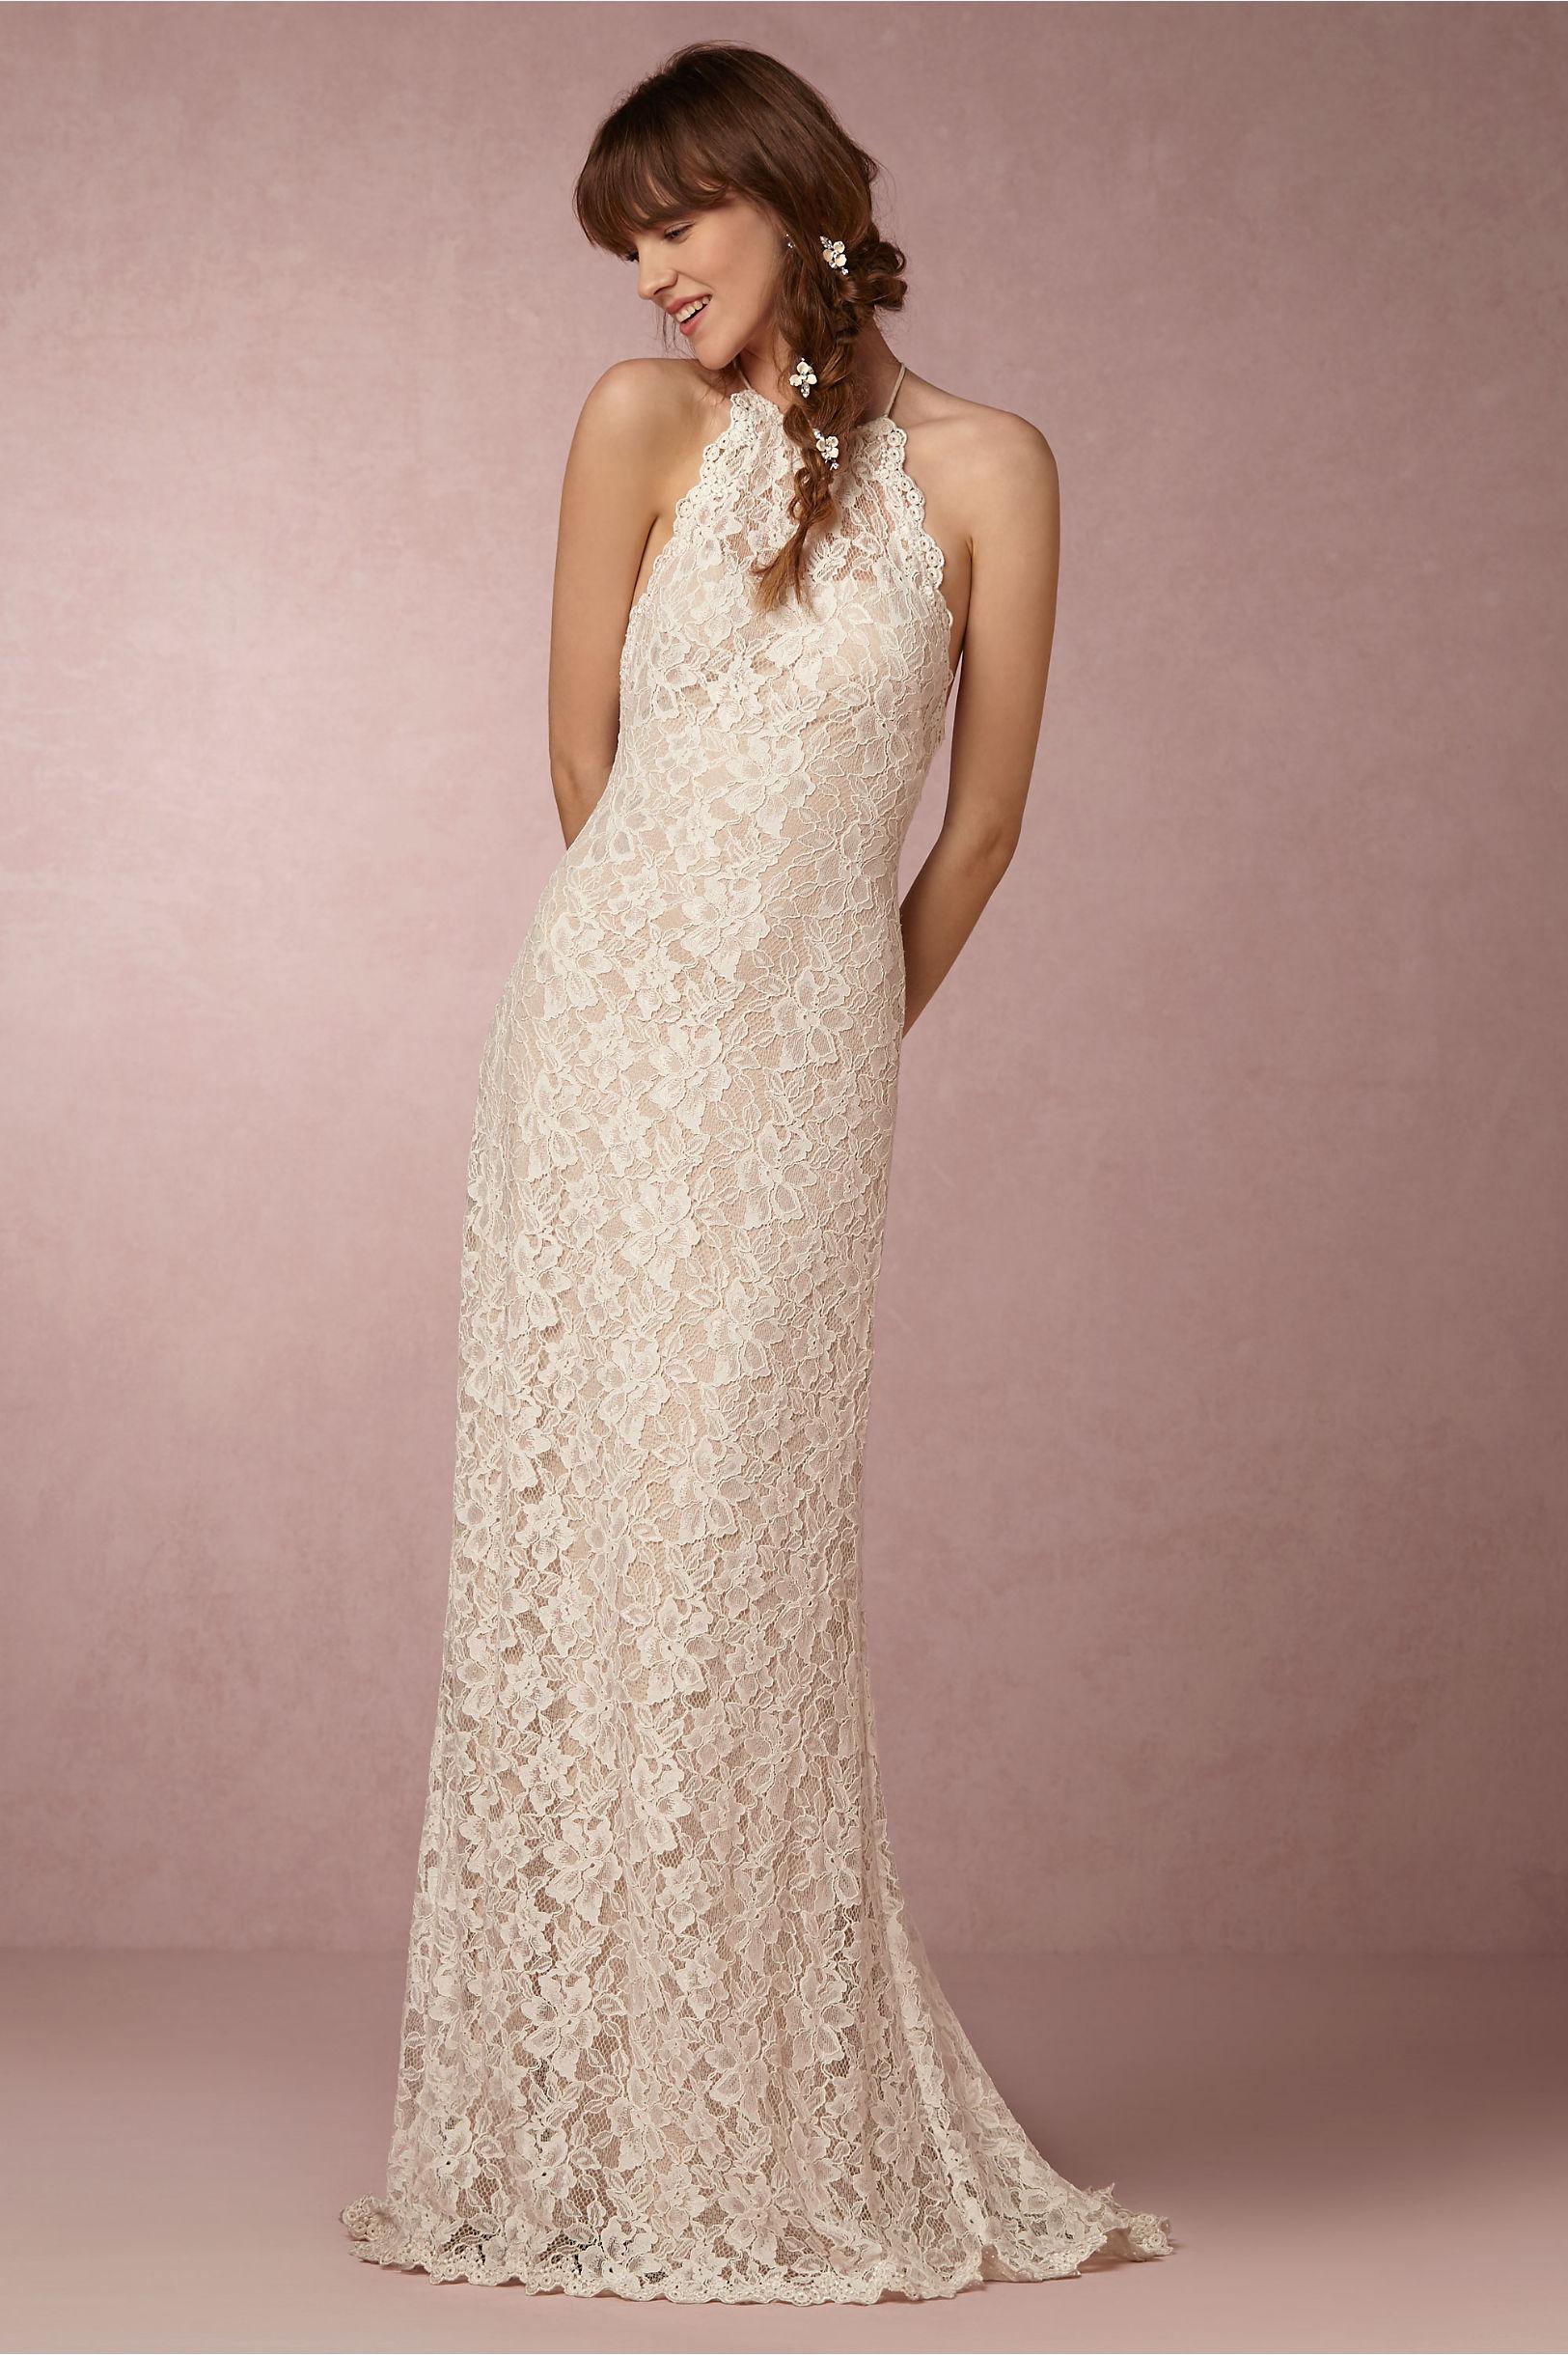 Mina Gown in Sale | BHLDN